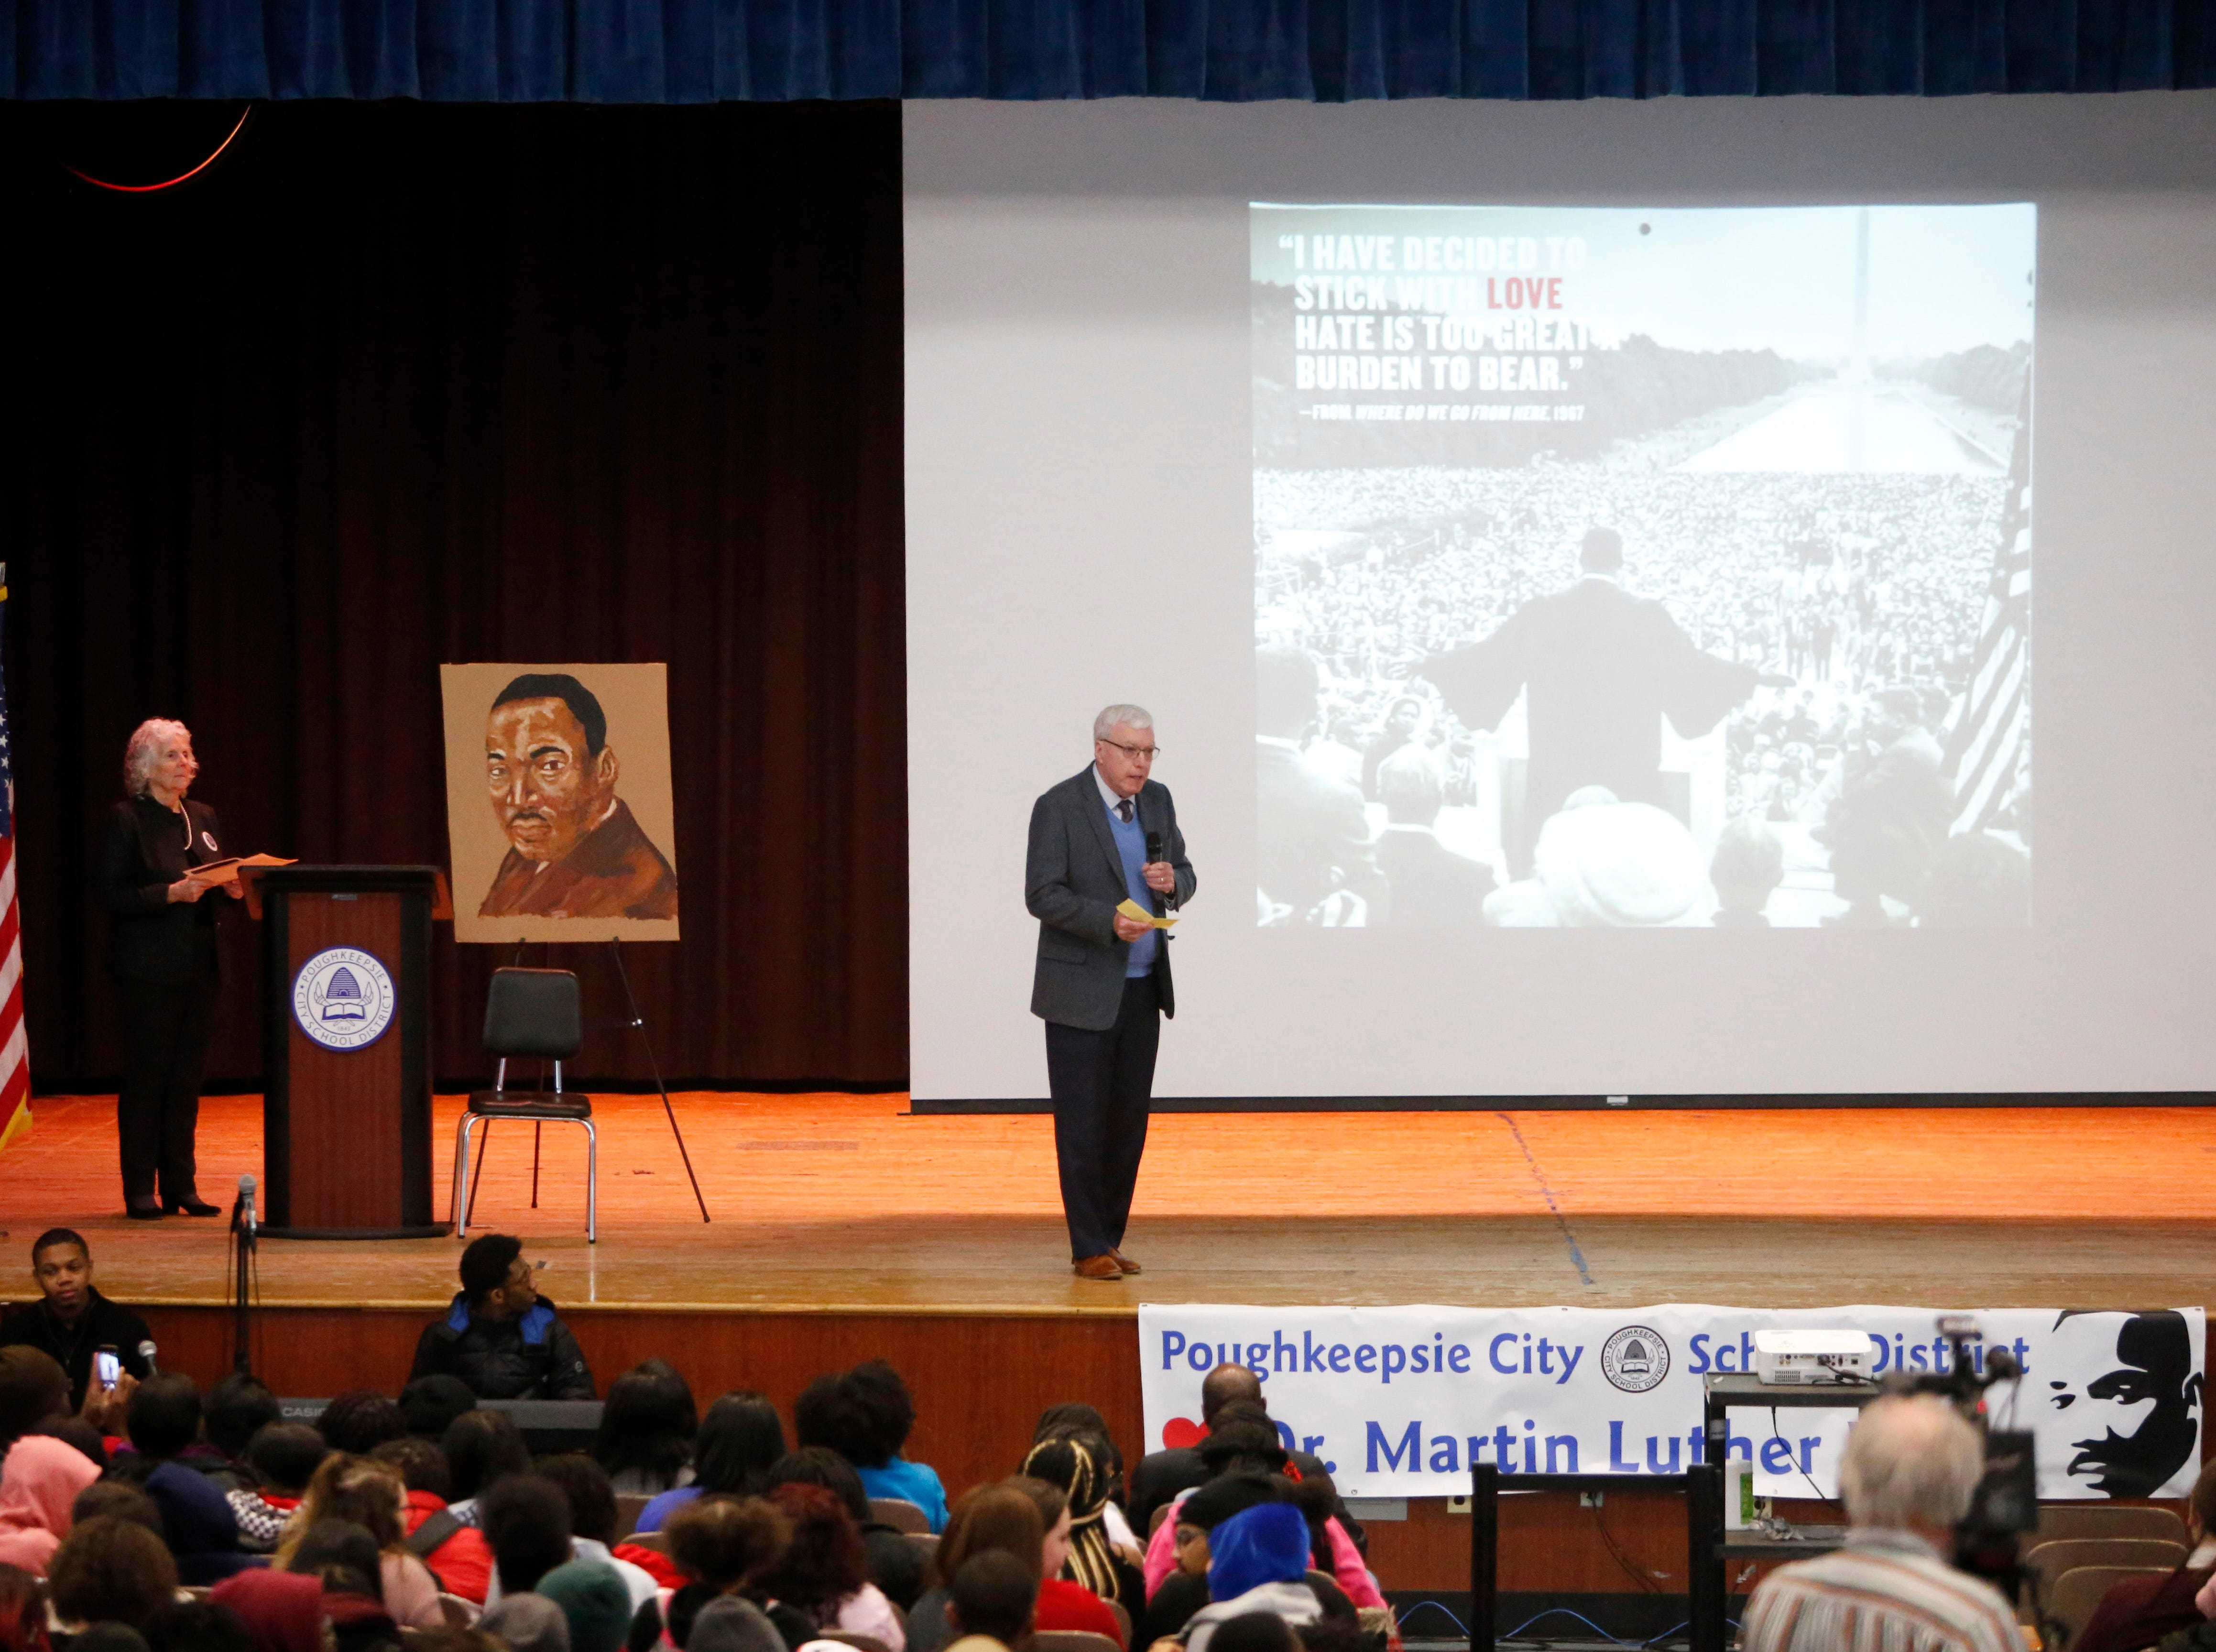 Retired City of Poughkeepsie Court judge Thomas J. O'Neill speaks during Thursday's Martin Luther King Celebration at Poughkeepsie High School on February 14, 2019.